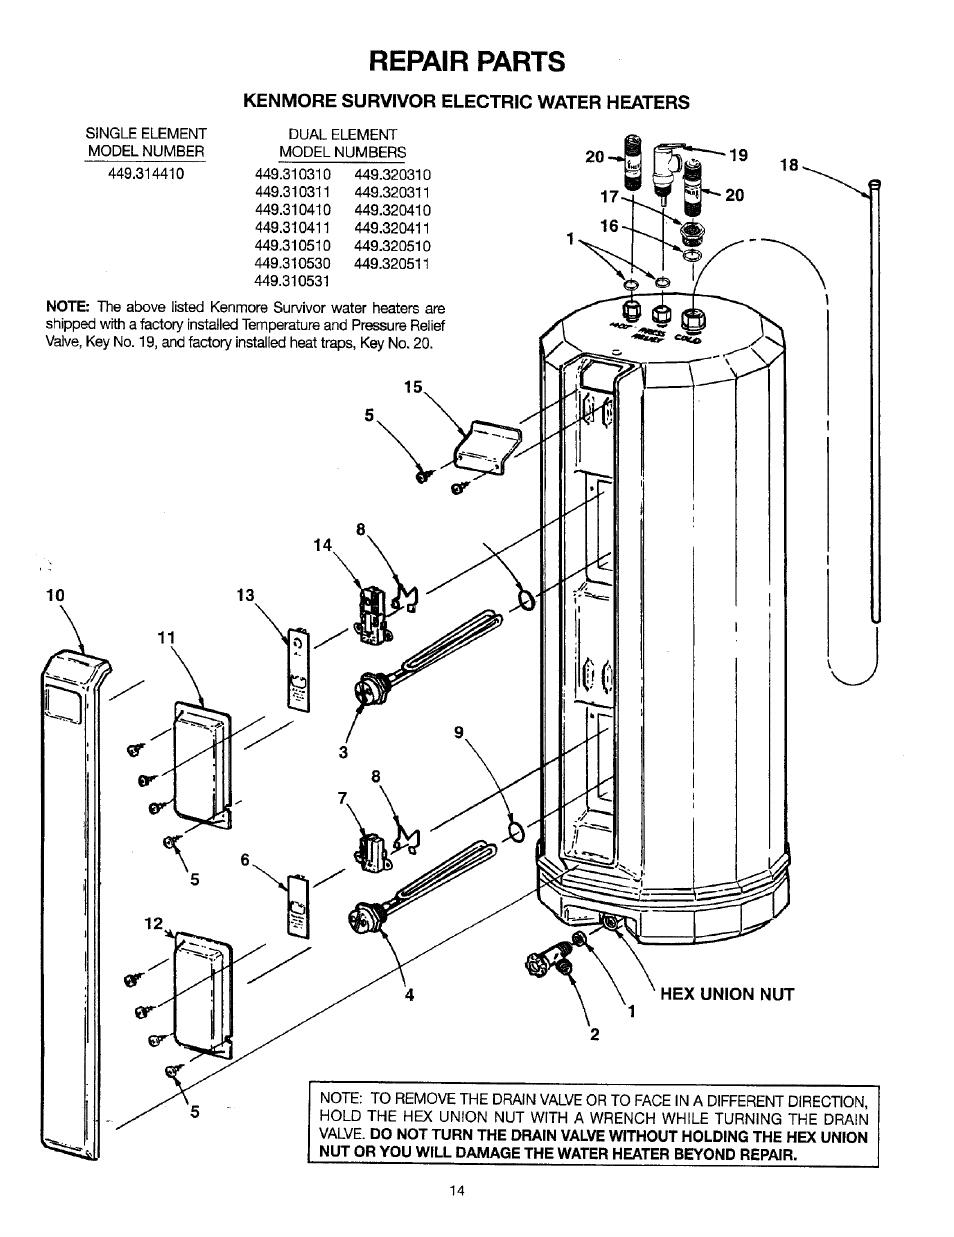 Sears Water Heater Installation Cost : sears, water, heater, installation, Sears, Kenmore, Water, Heater